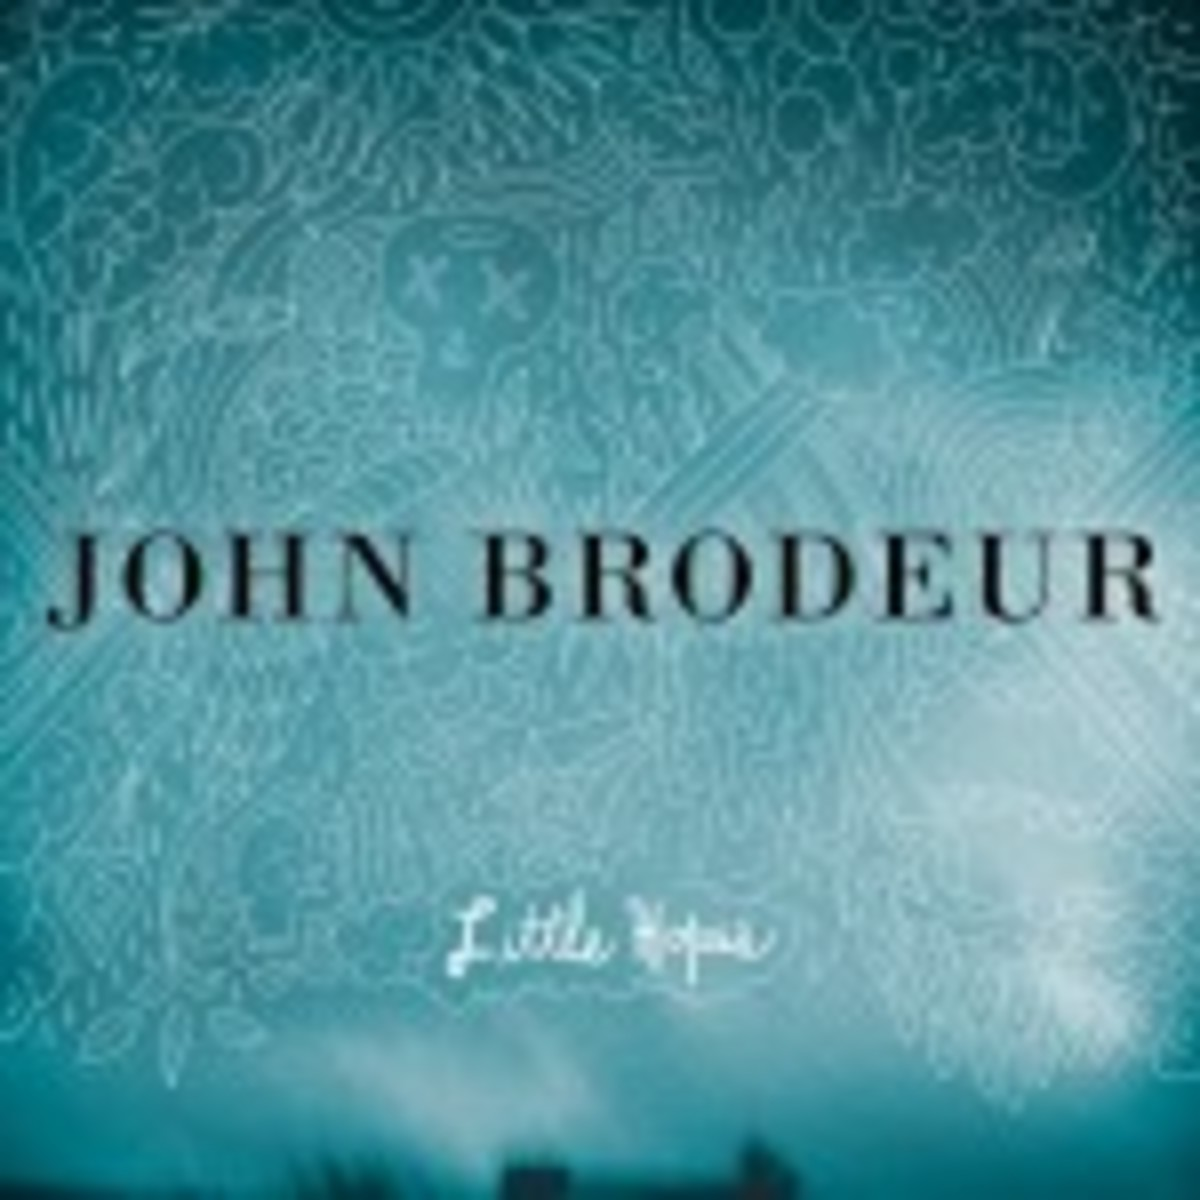 10-16-Discs-John-Brodeur-Little-Hopes-1024x1024